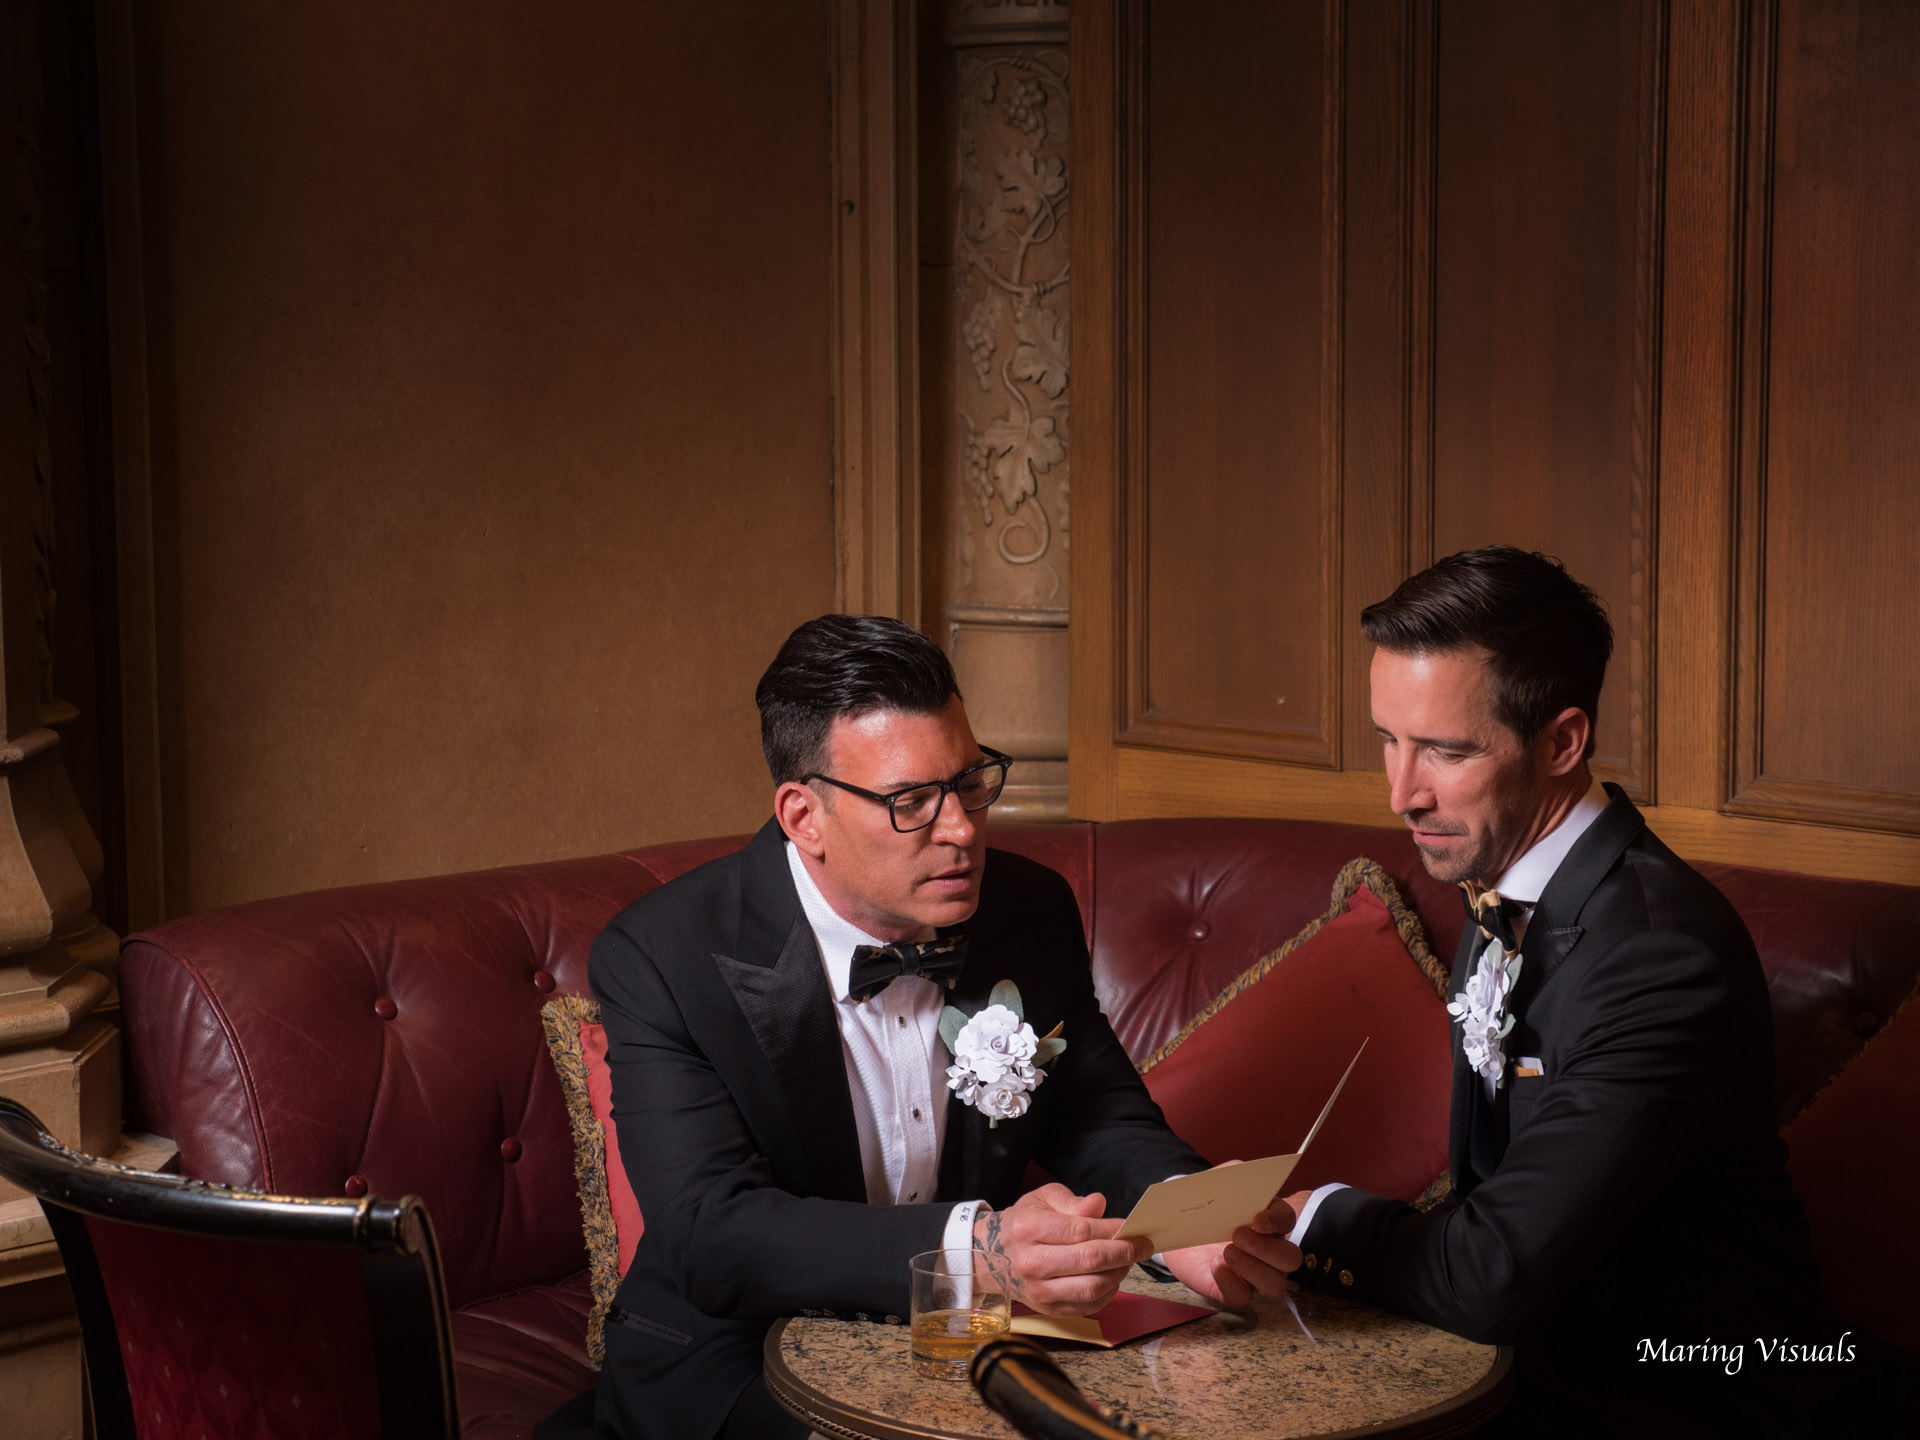 David Tutera Weddings by Maring Visuals 00500.jpg